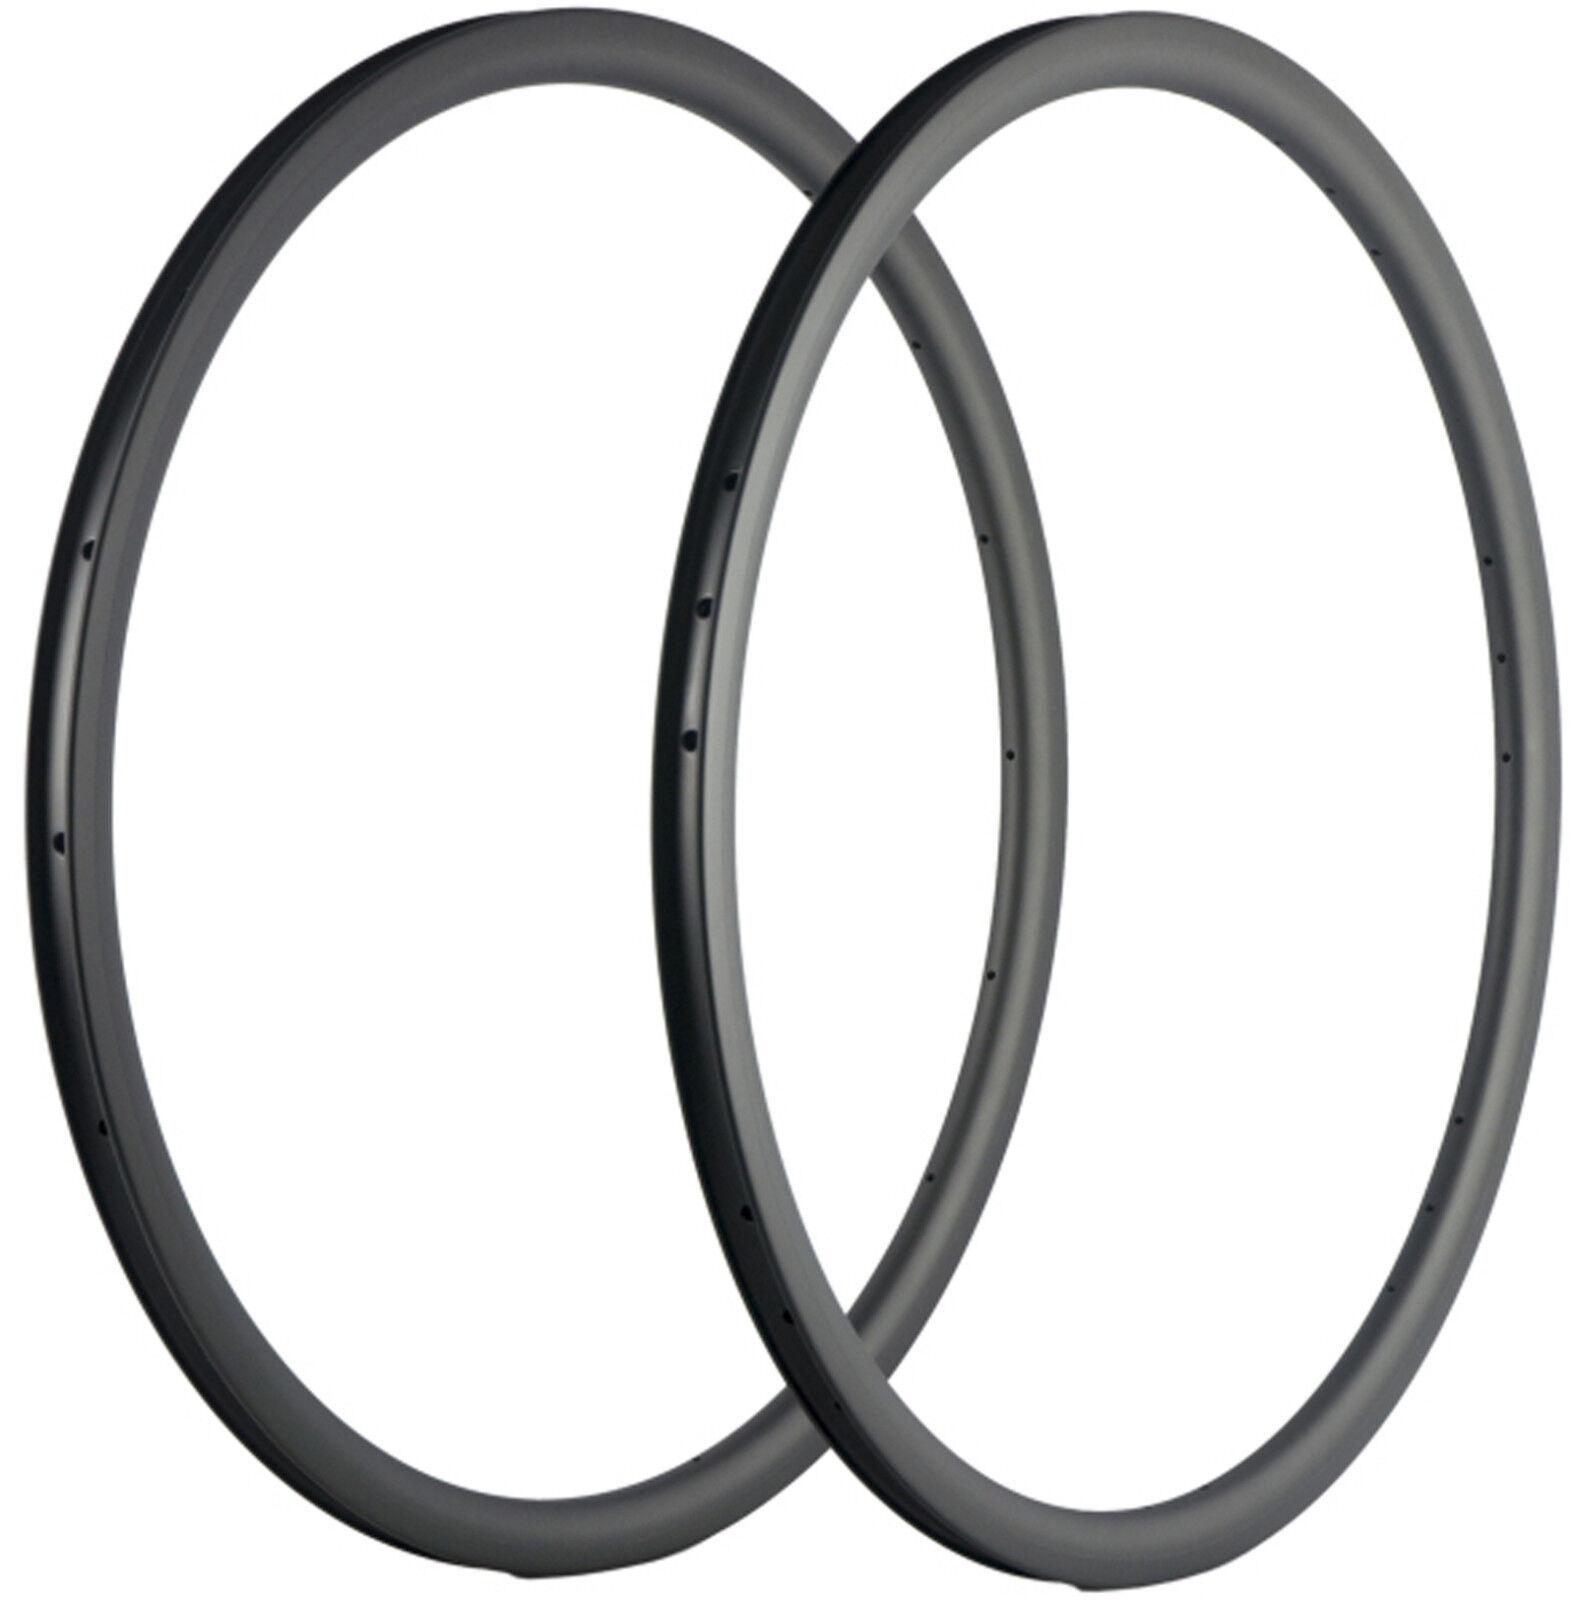 30mm Depth Bicycle Carbon Rims 25mm U Shape Road Bike Cycle Rims 18 20 21 24 UD